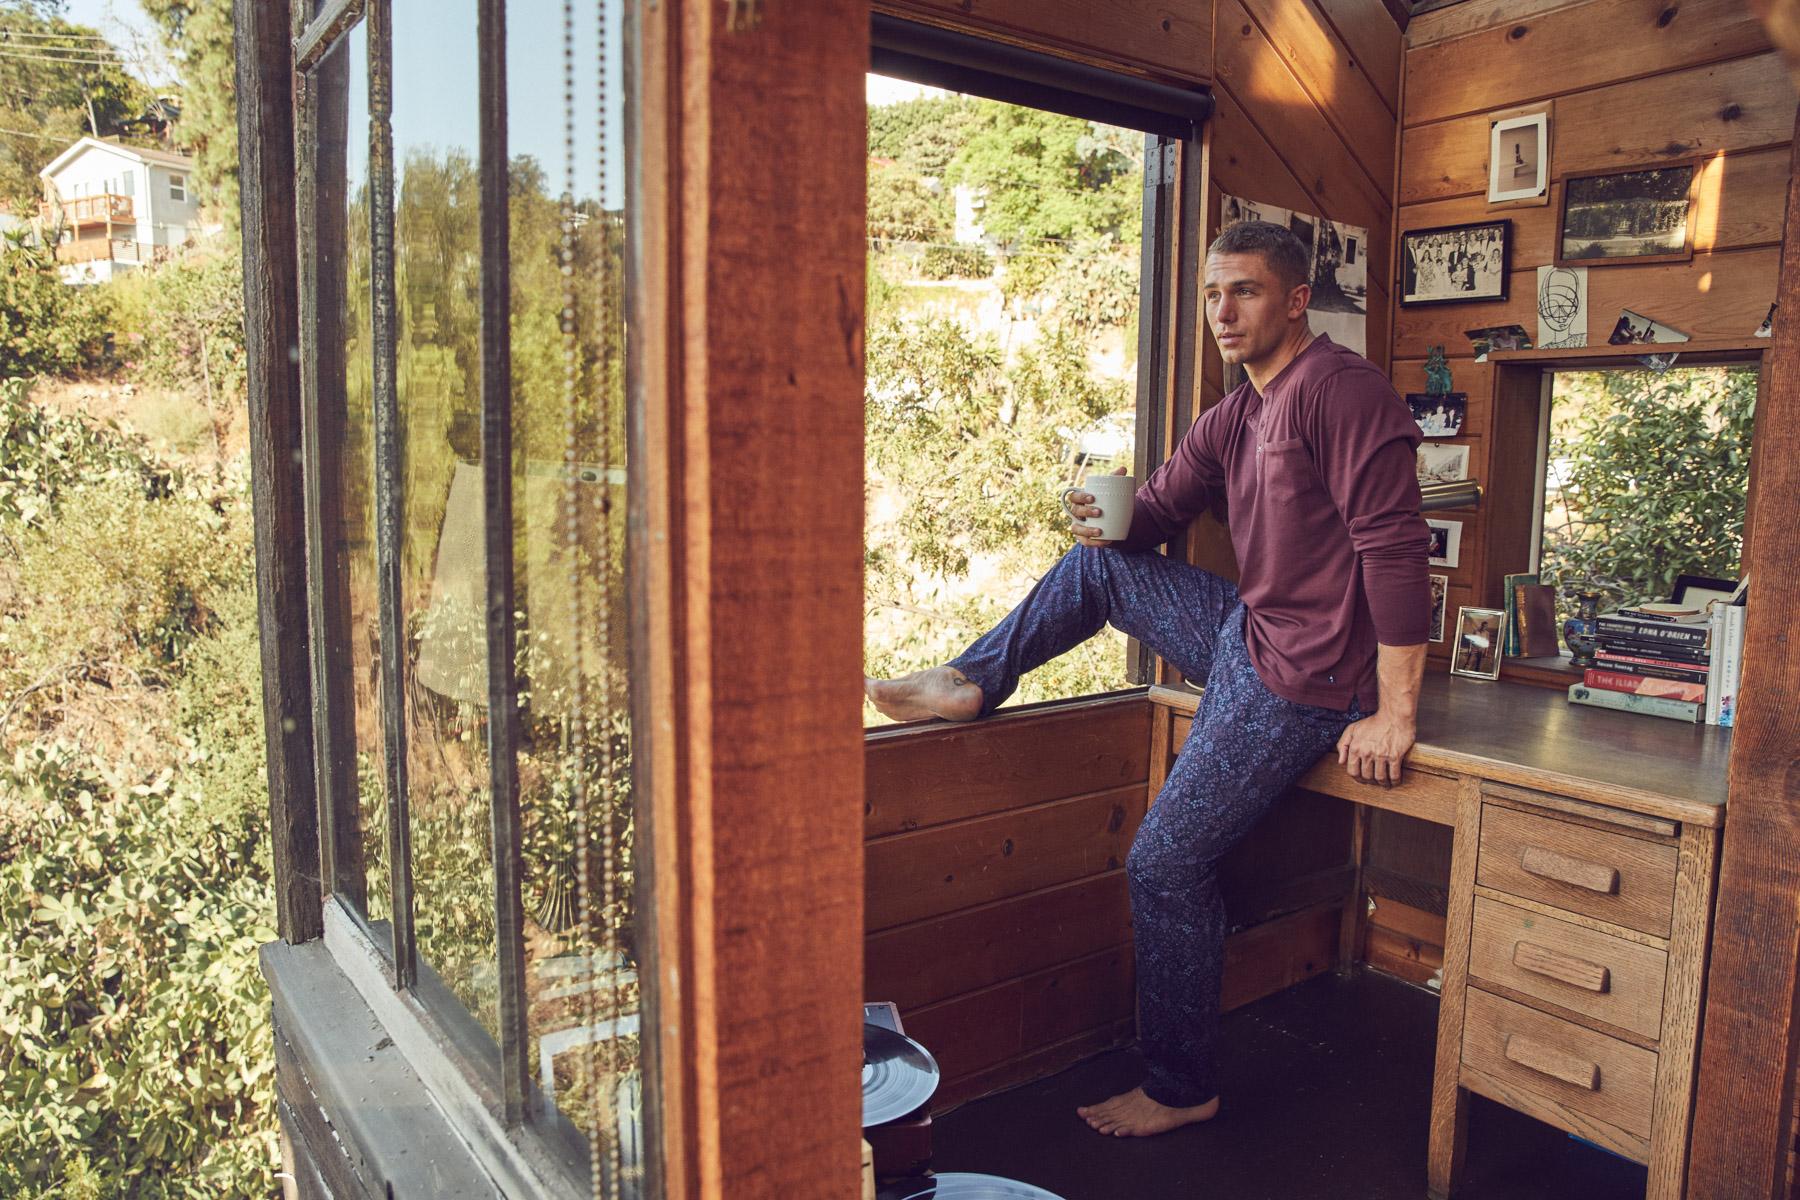 California, Jockey Europe, Justin Chung, Los Angeles